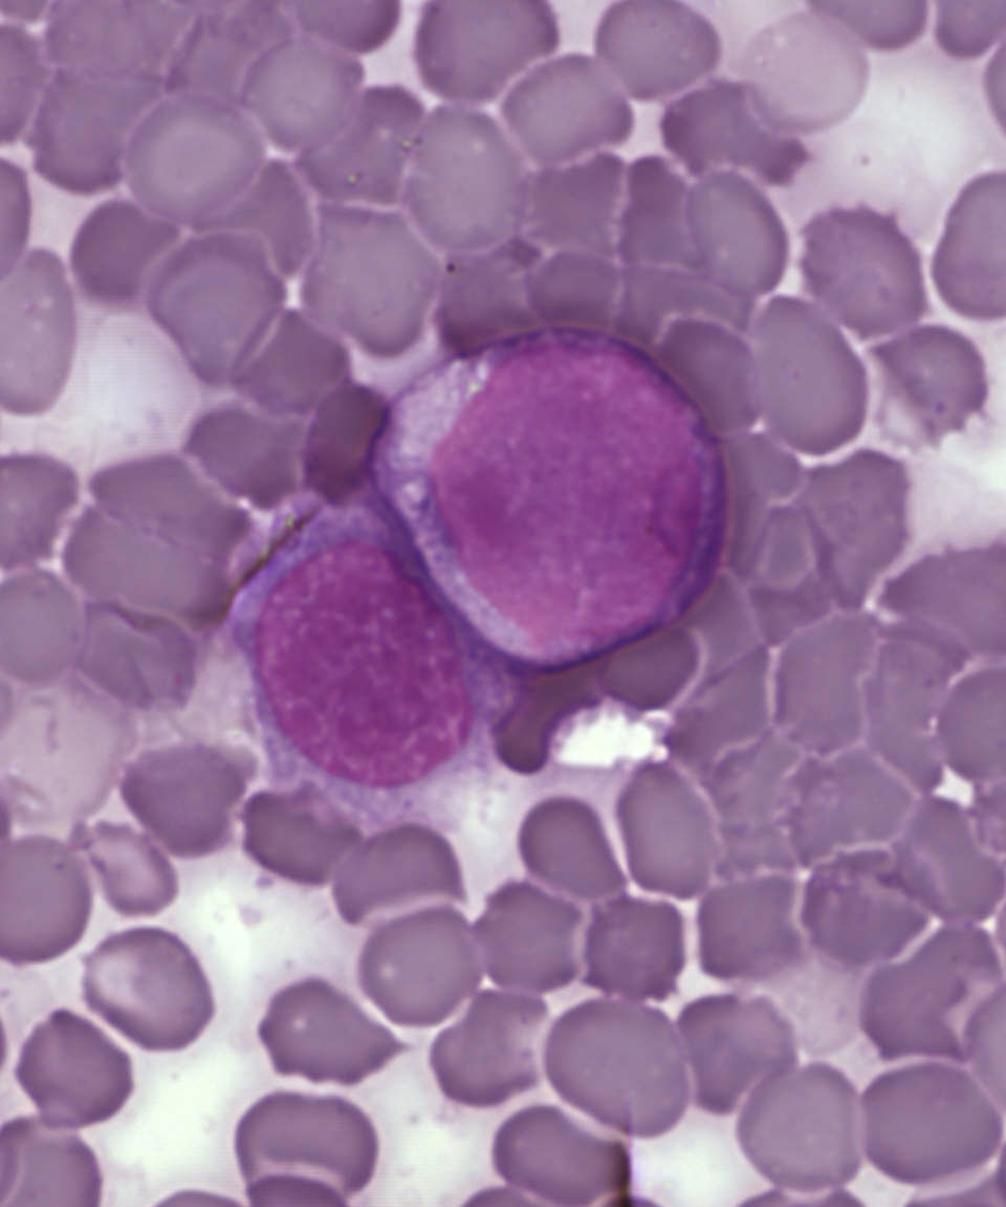 leukemické buňky v nátěru krve, (2005) A Surprising New Path to Tumor Development. PLoS Biol 3(12): e433. doi:10.1371/journal.pbio.0030433